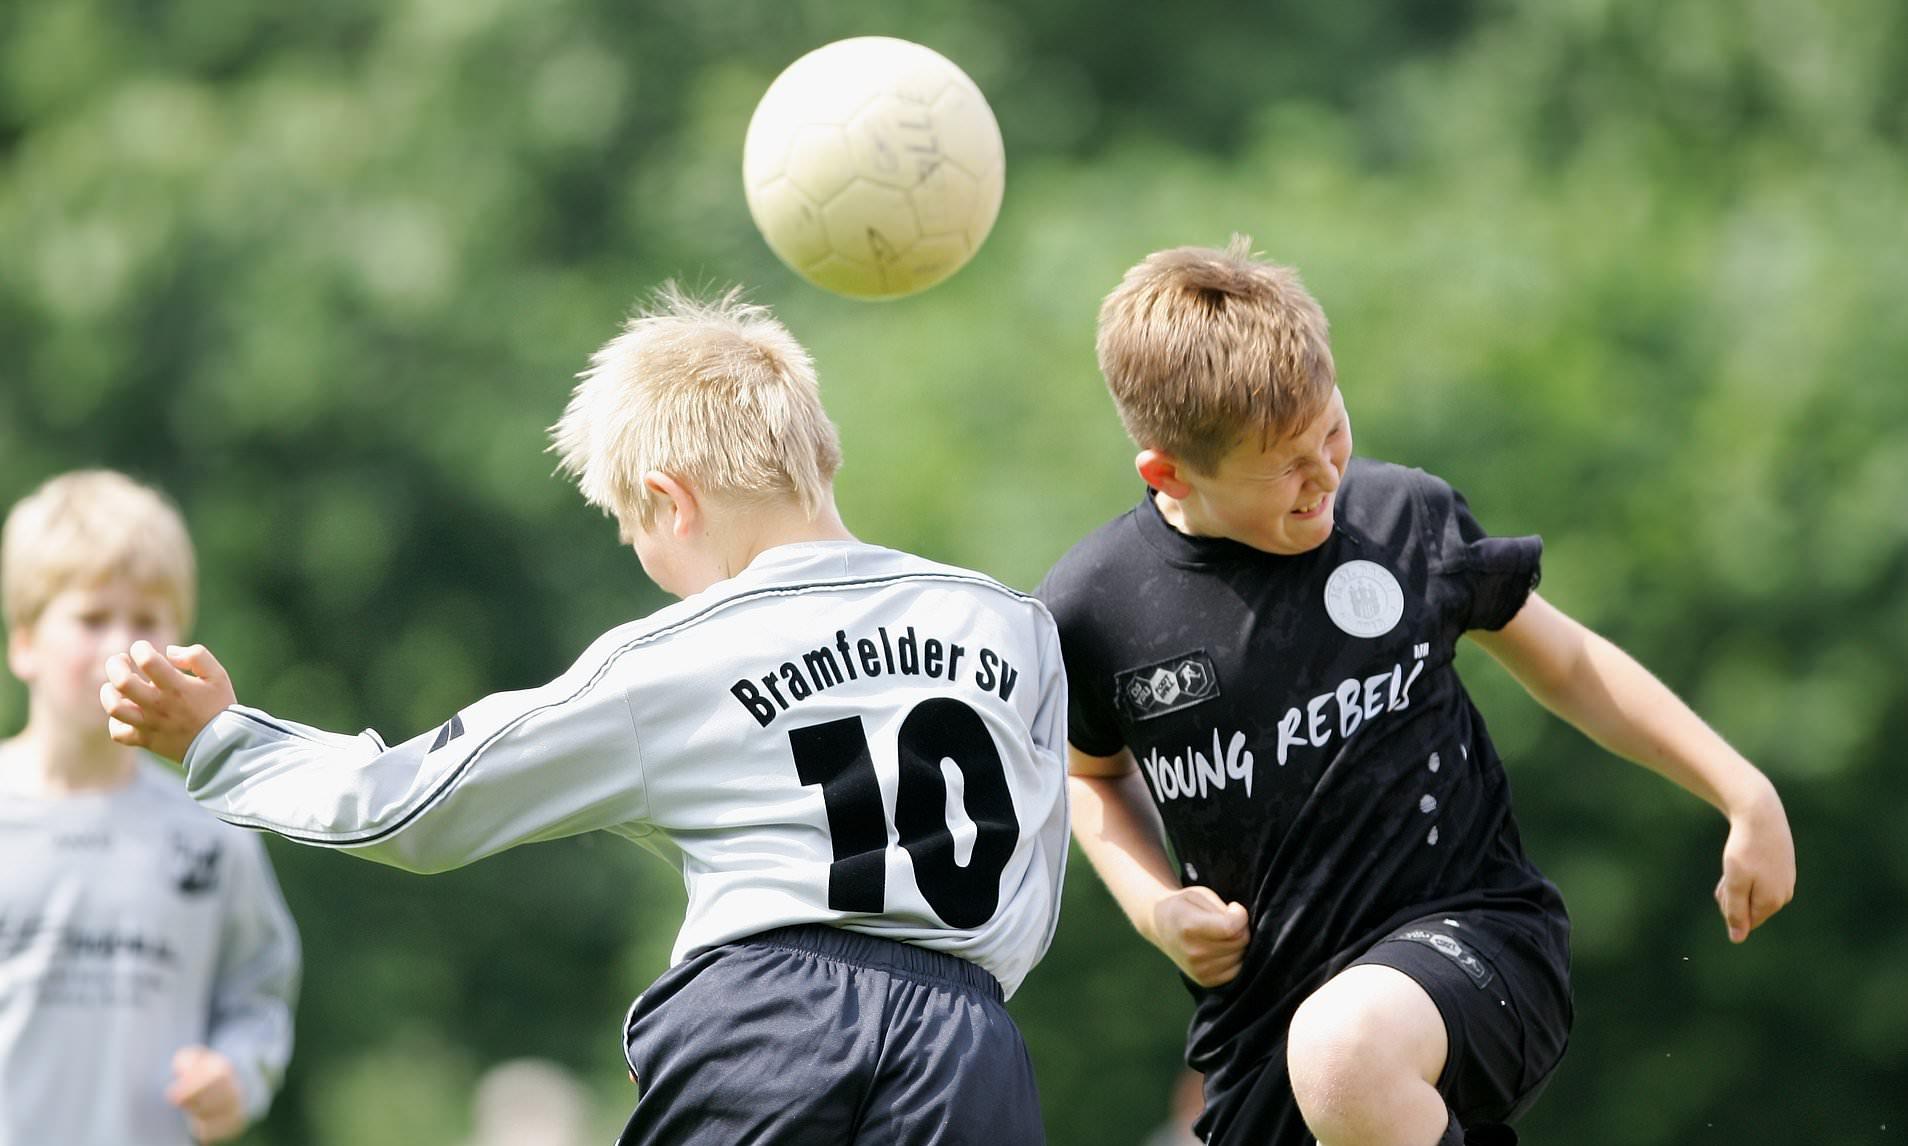 Ilustrasi pemain muda menyundul bola | foto internet